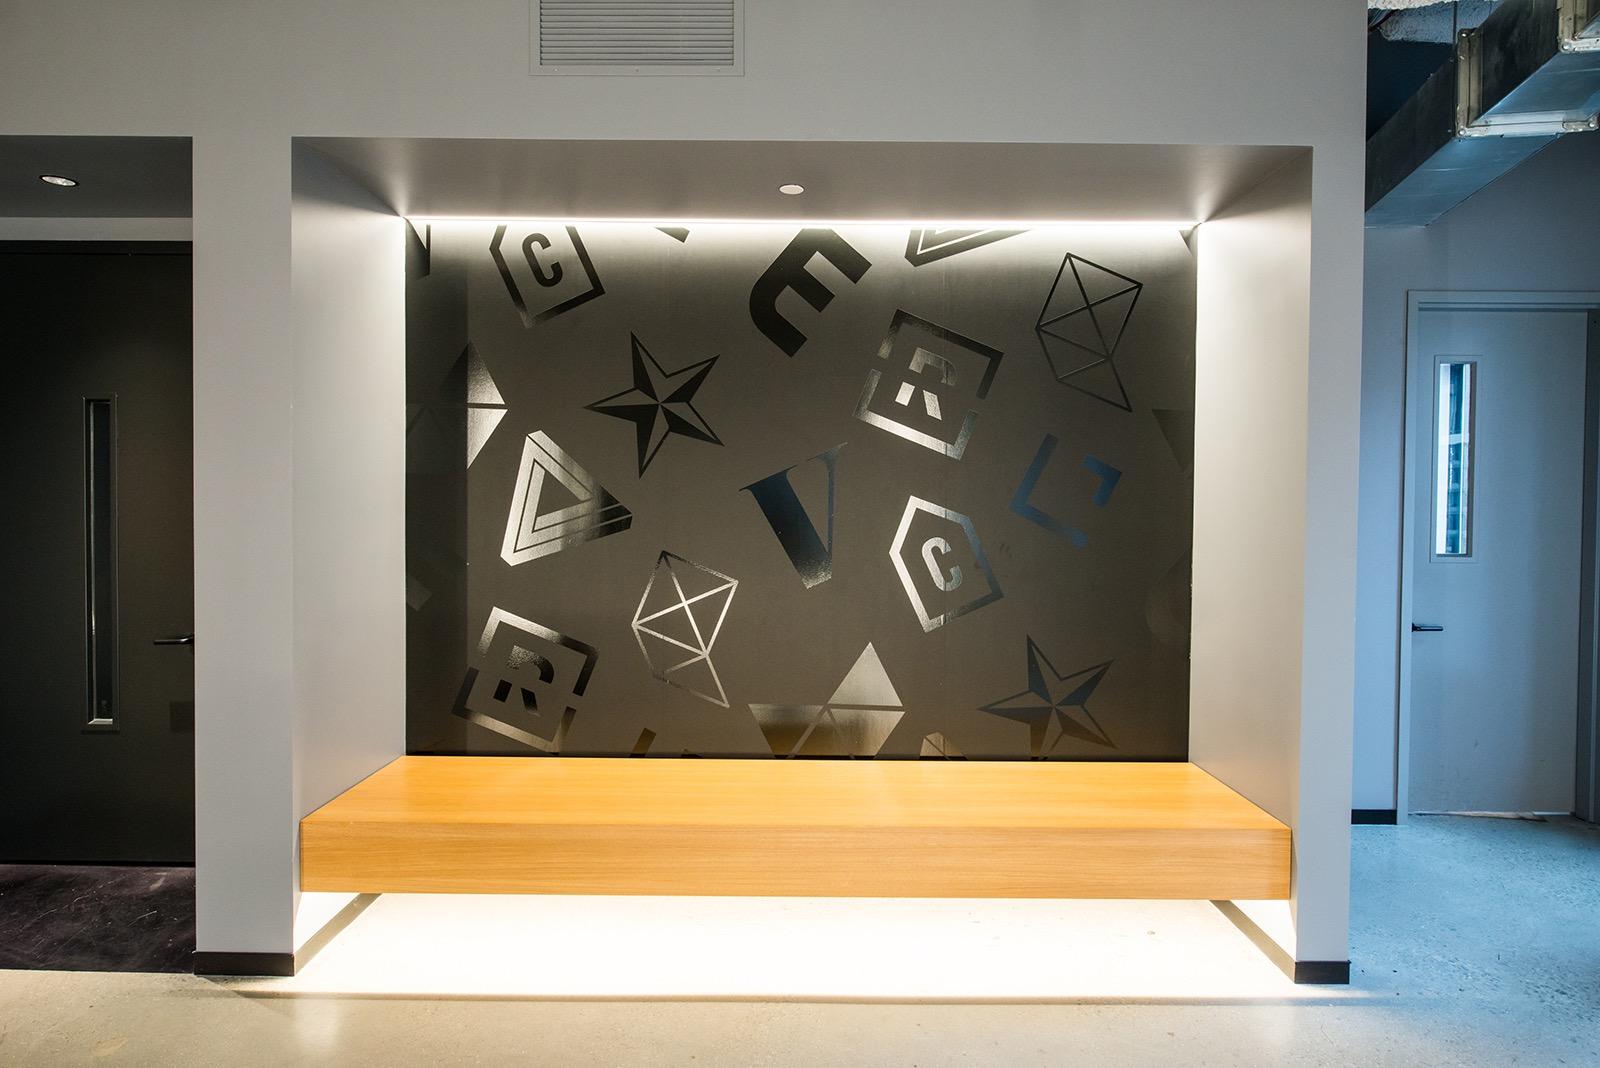 vox-media-nyc-office-3